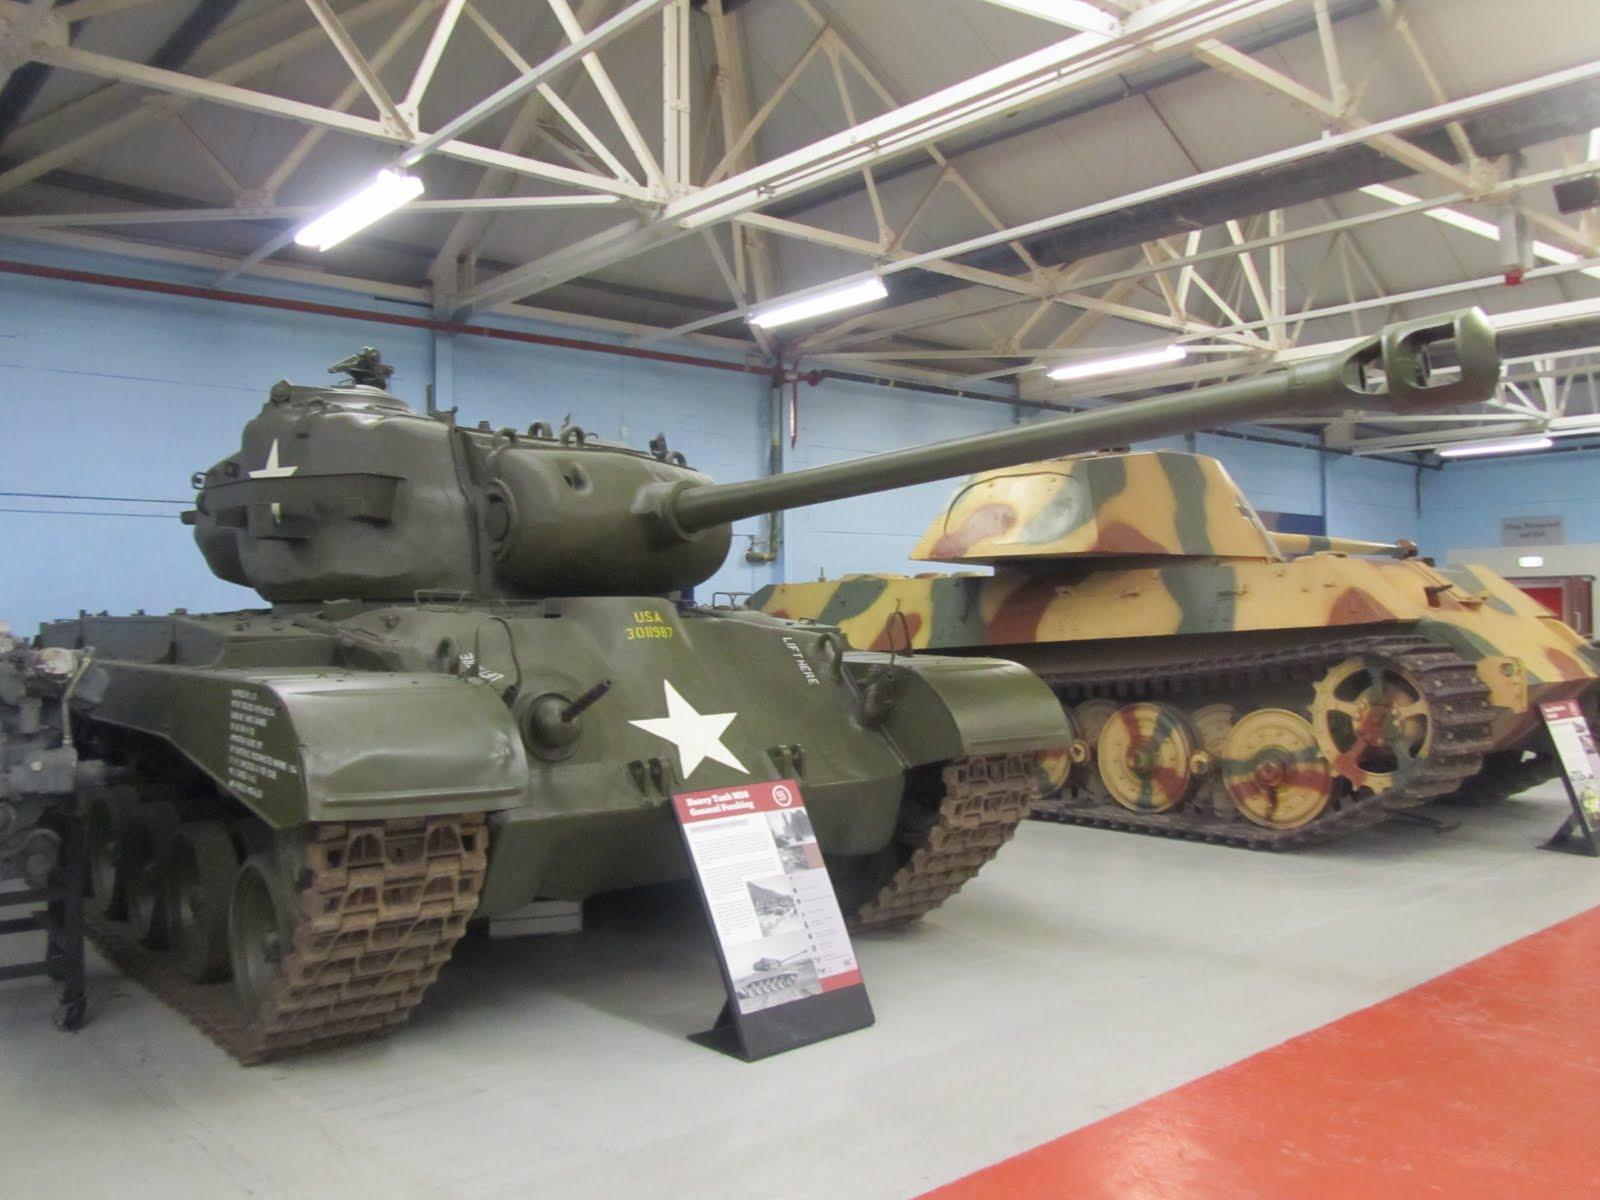 King tiger tank vs sherman - photo#3